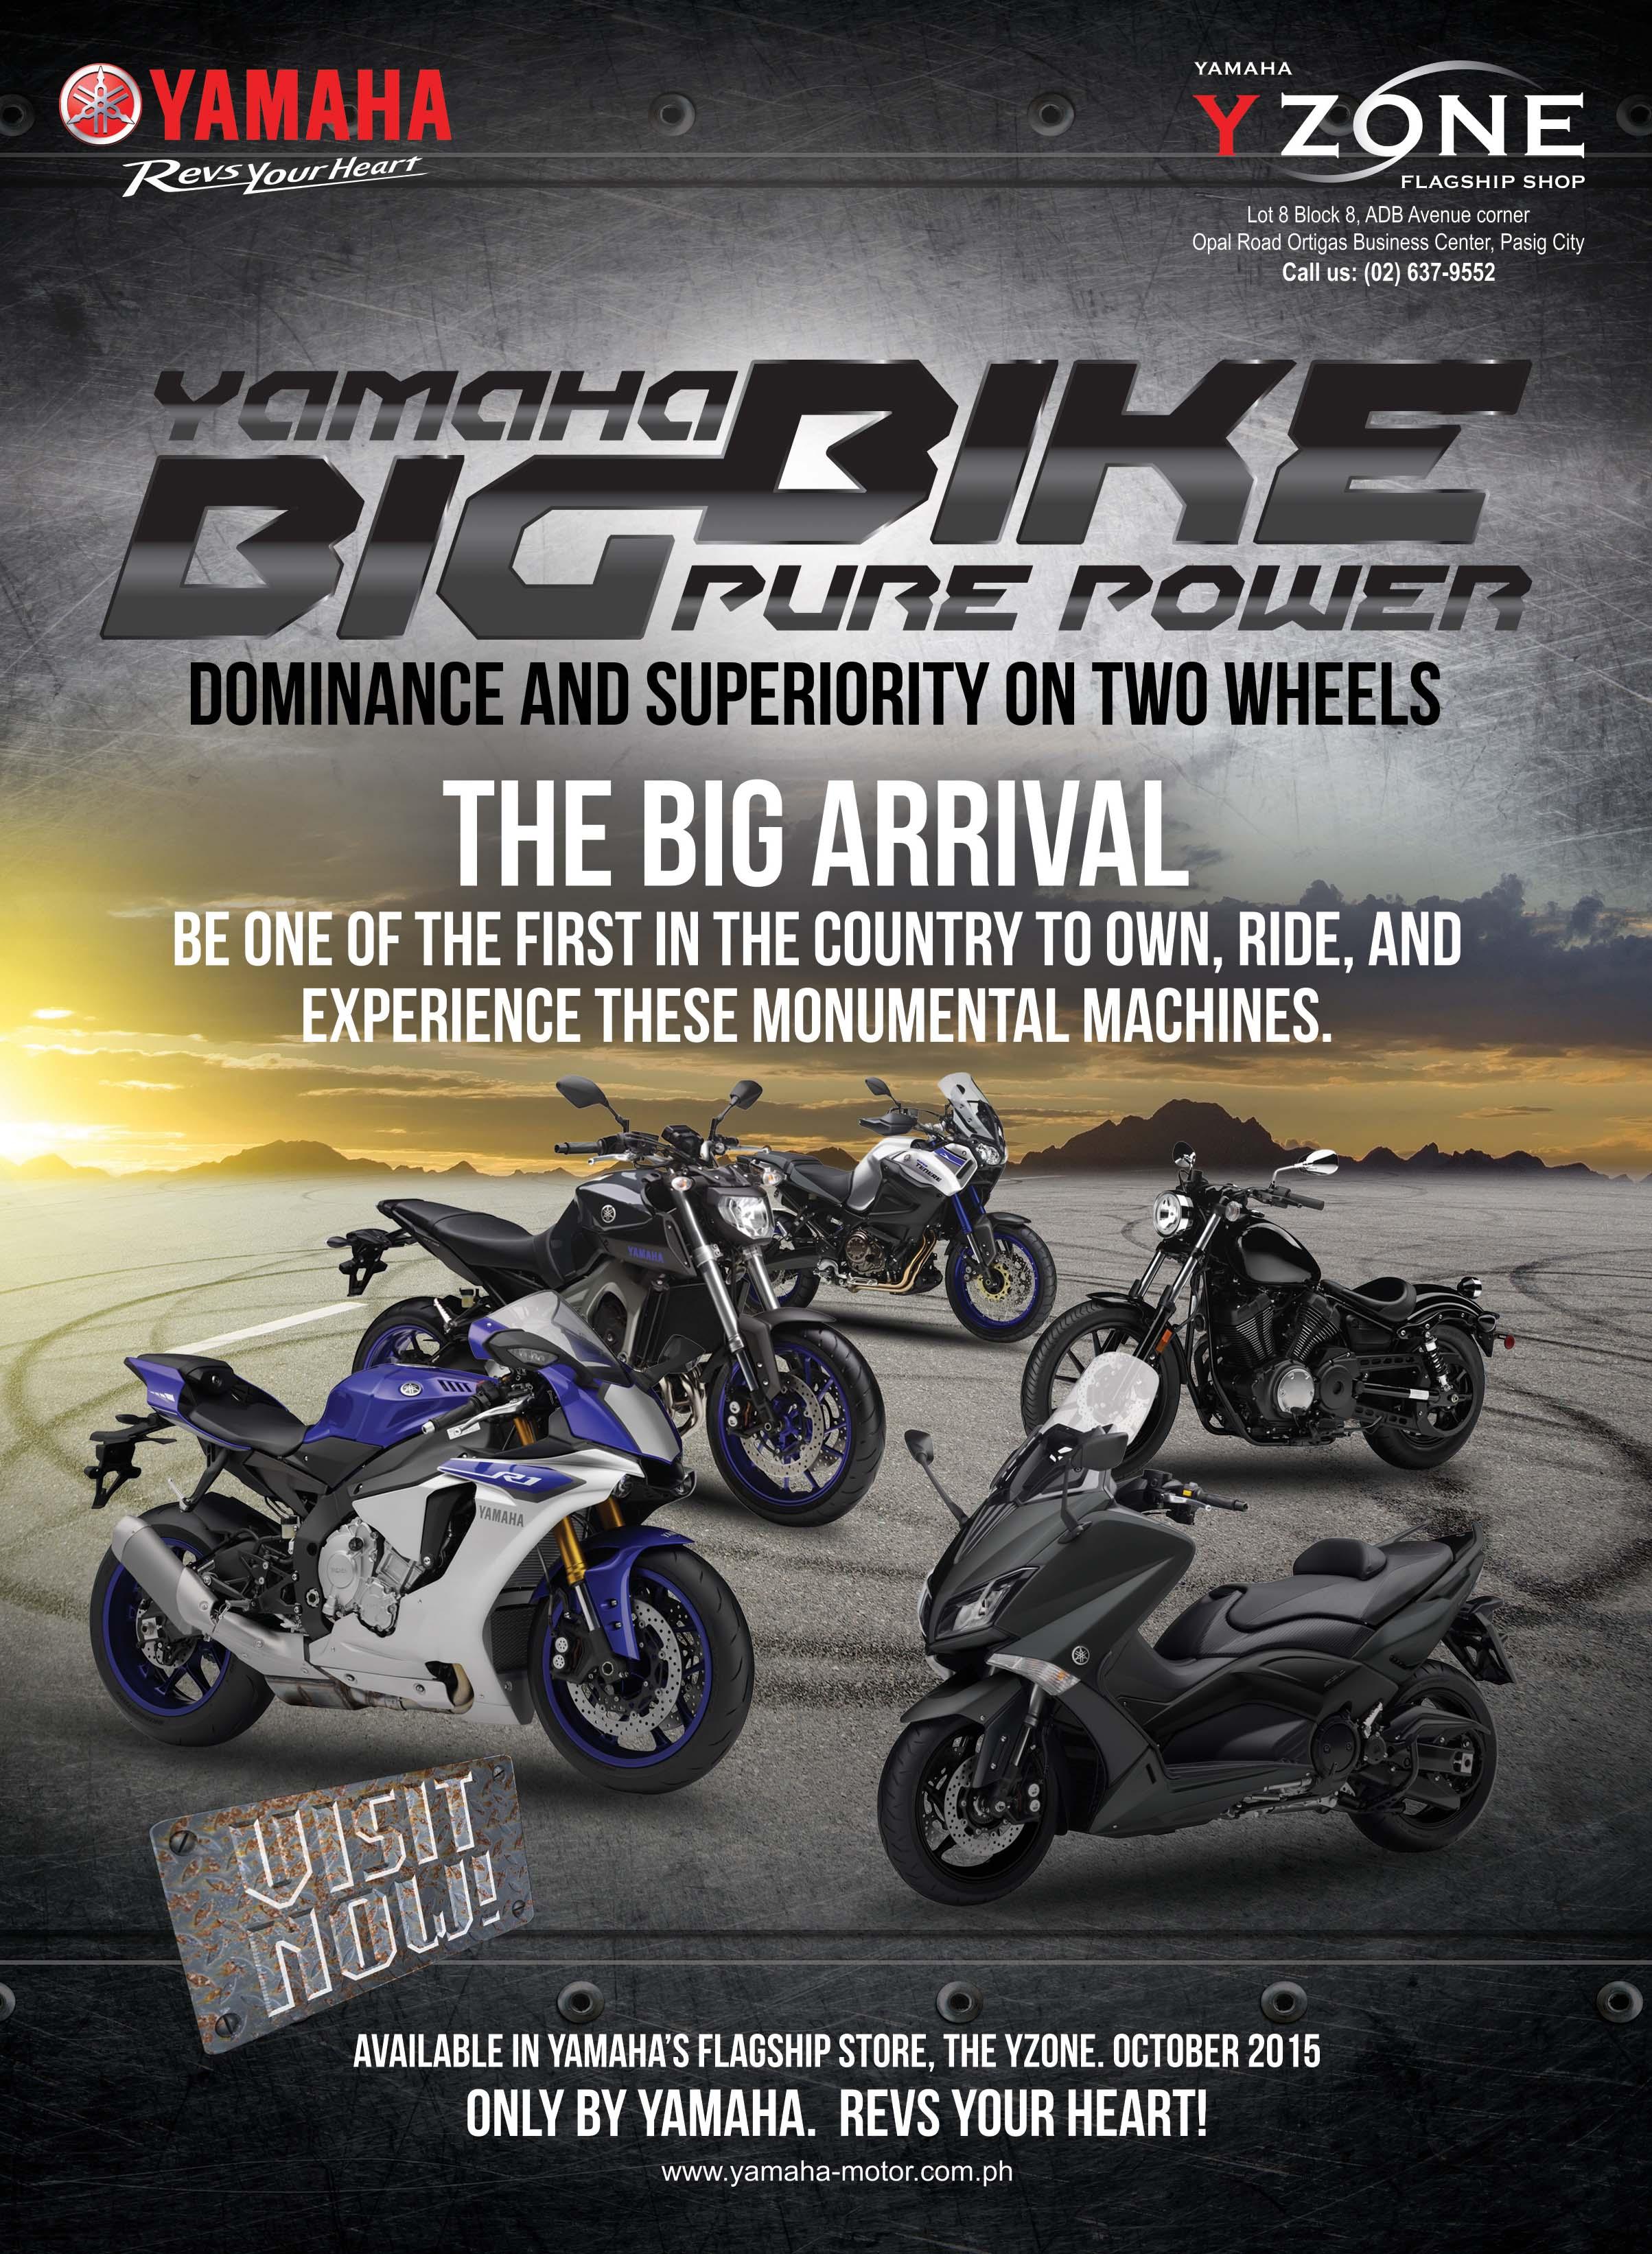 Yamaha Motorcycle Price Philippines